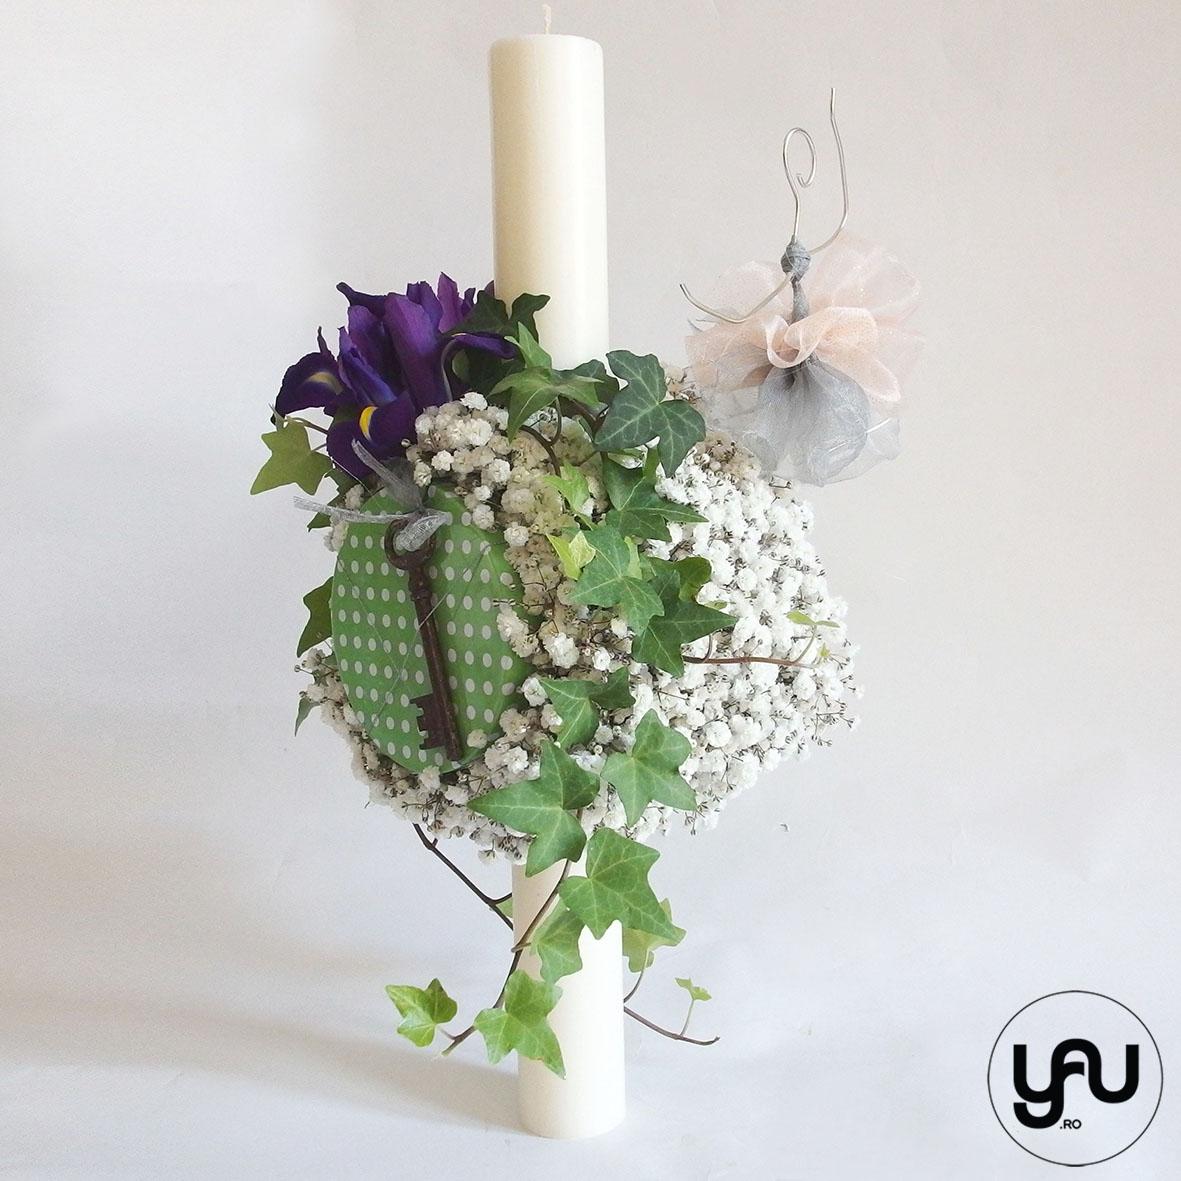 botez-cu-balerina-si-irisi-_-yau-evenimente-2016-_-elenatoader-11